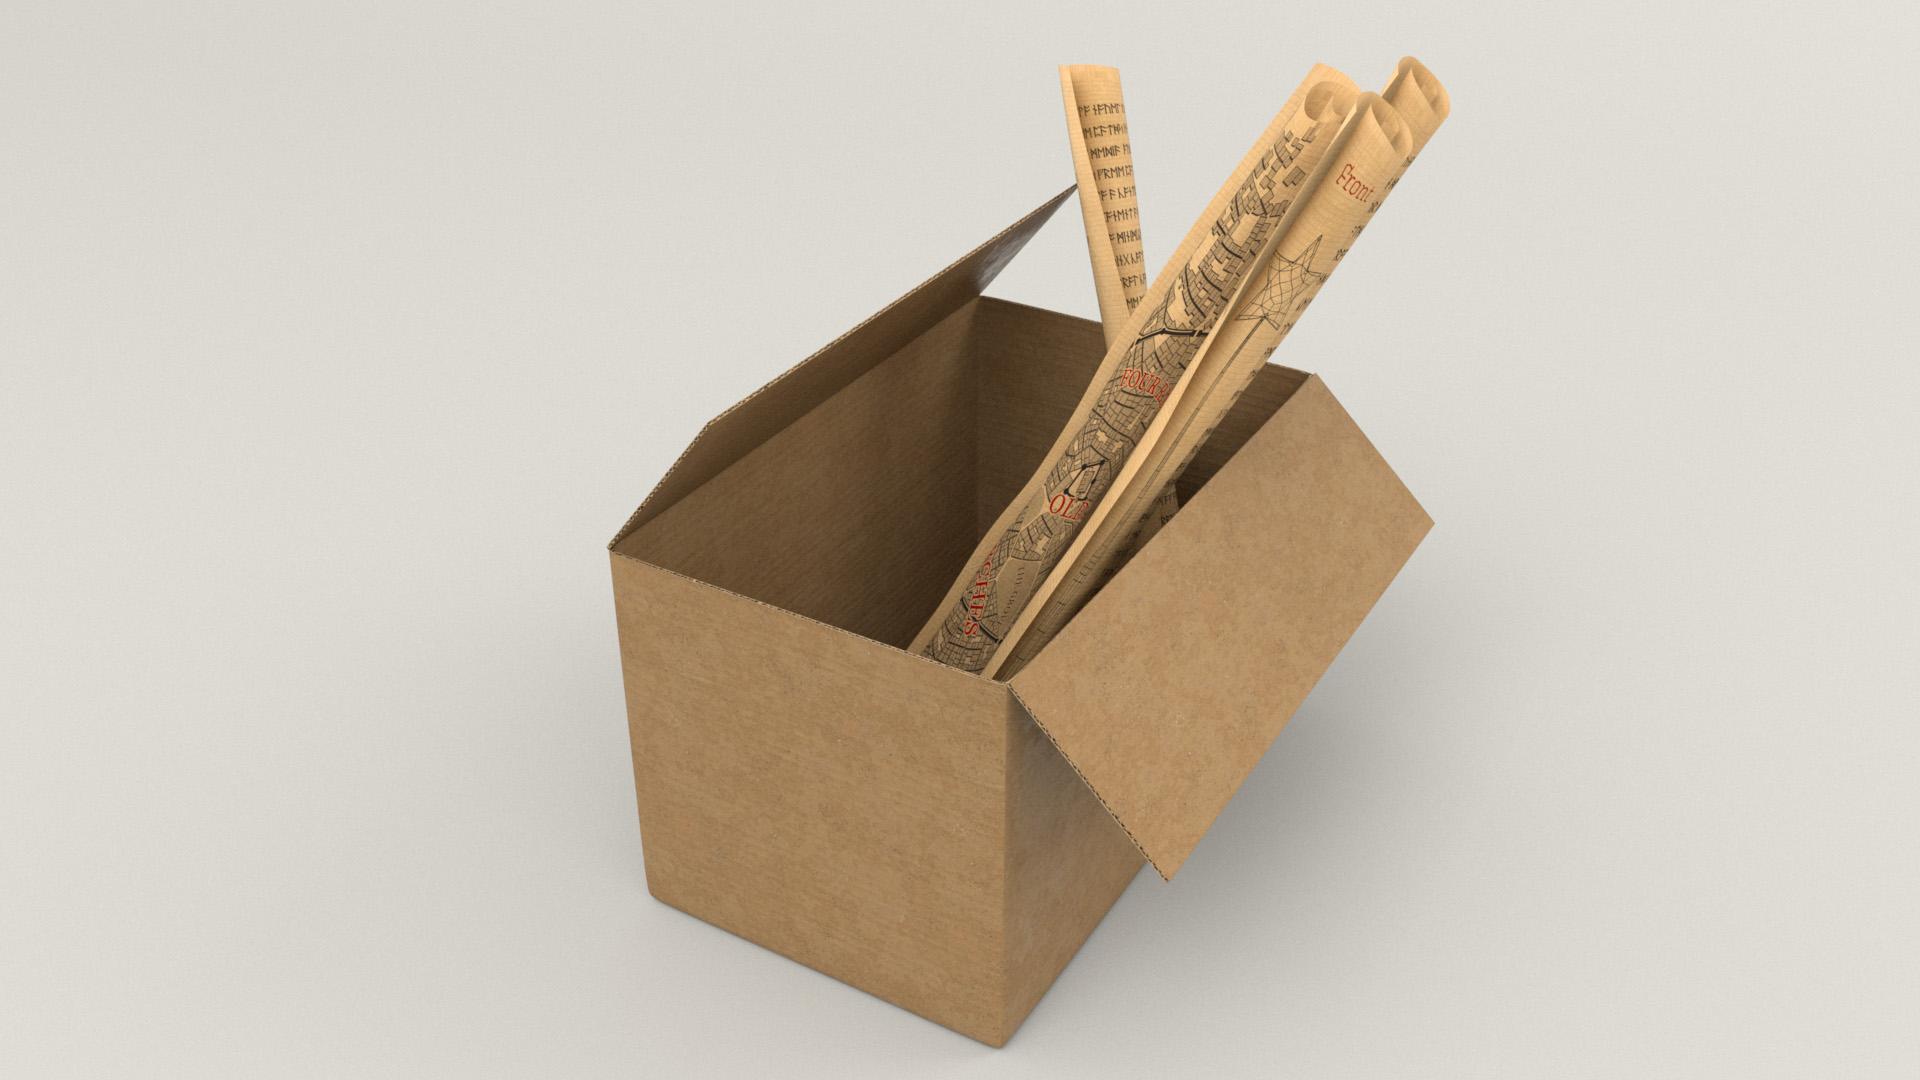 Figure 17: Corrugated cardboard box containing technical magic scrolls and maps.